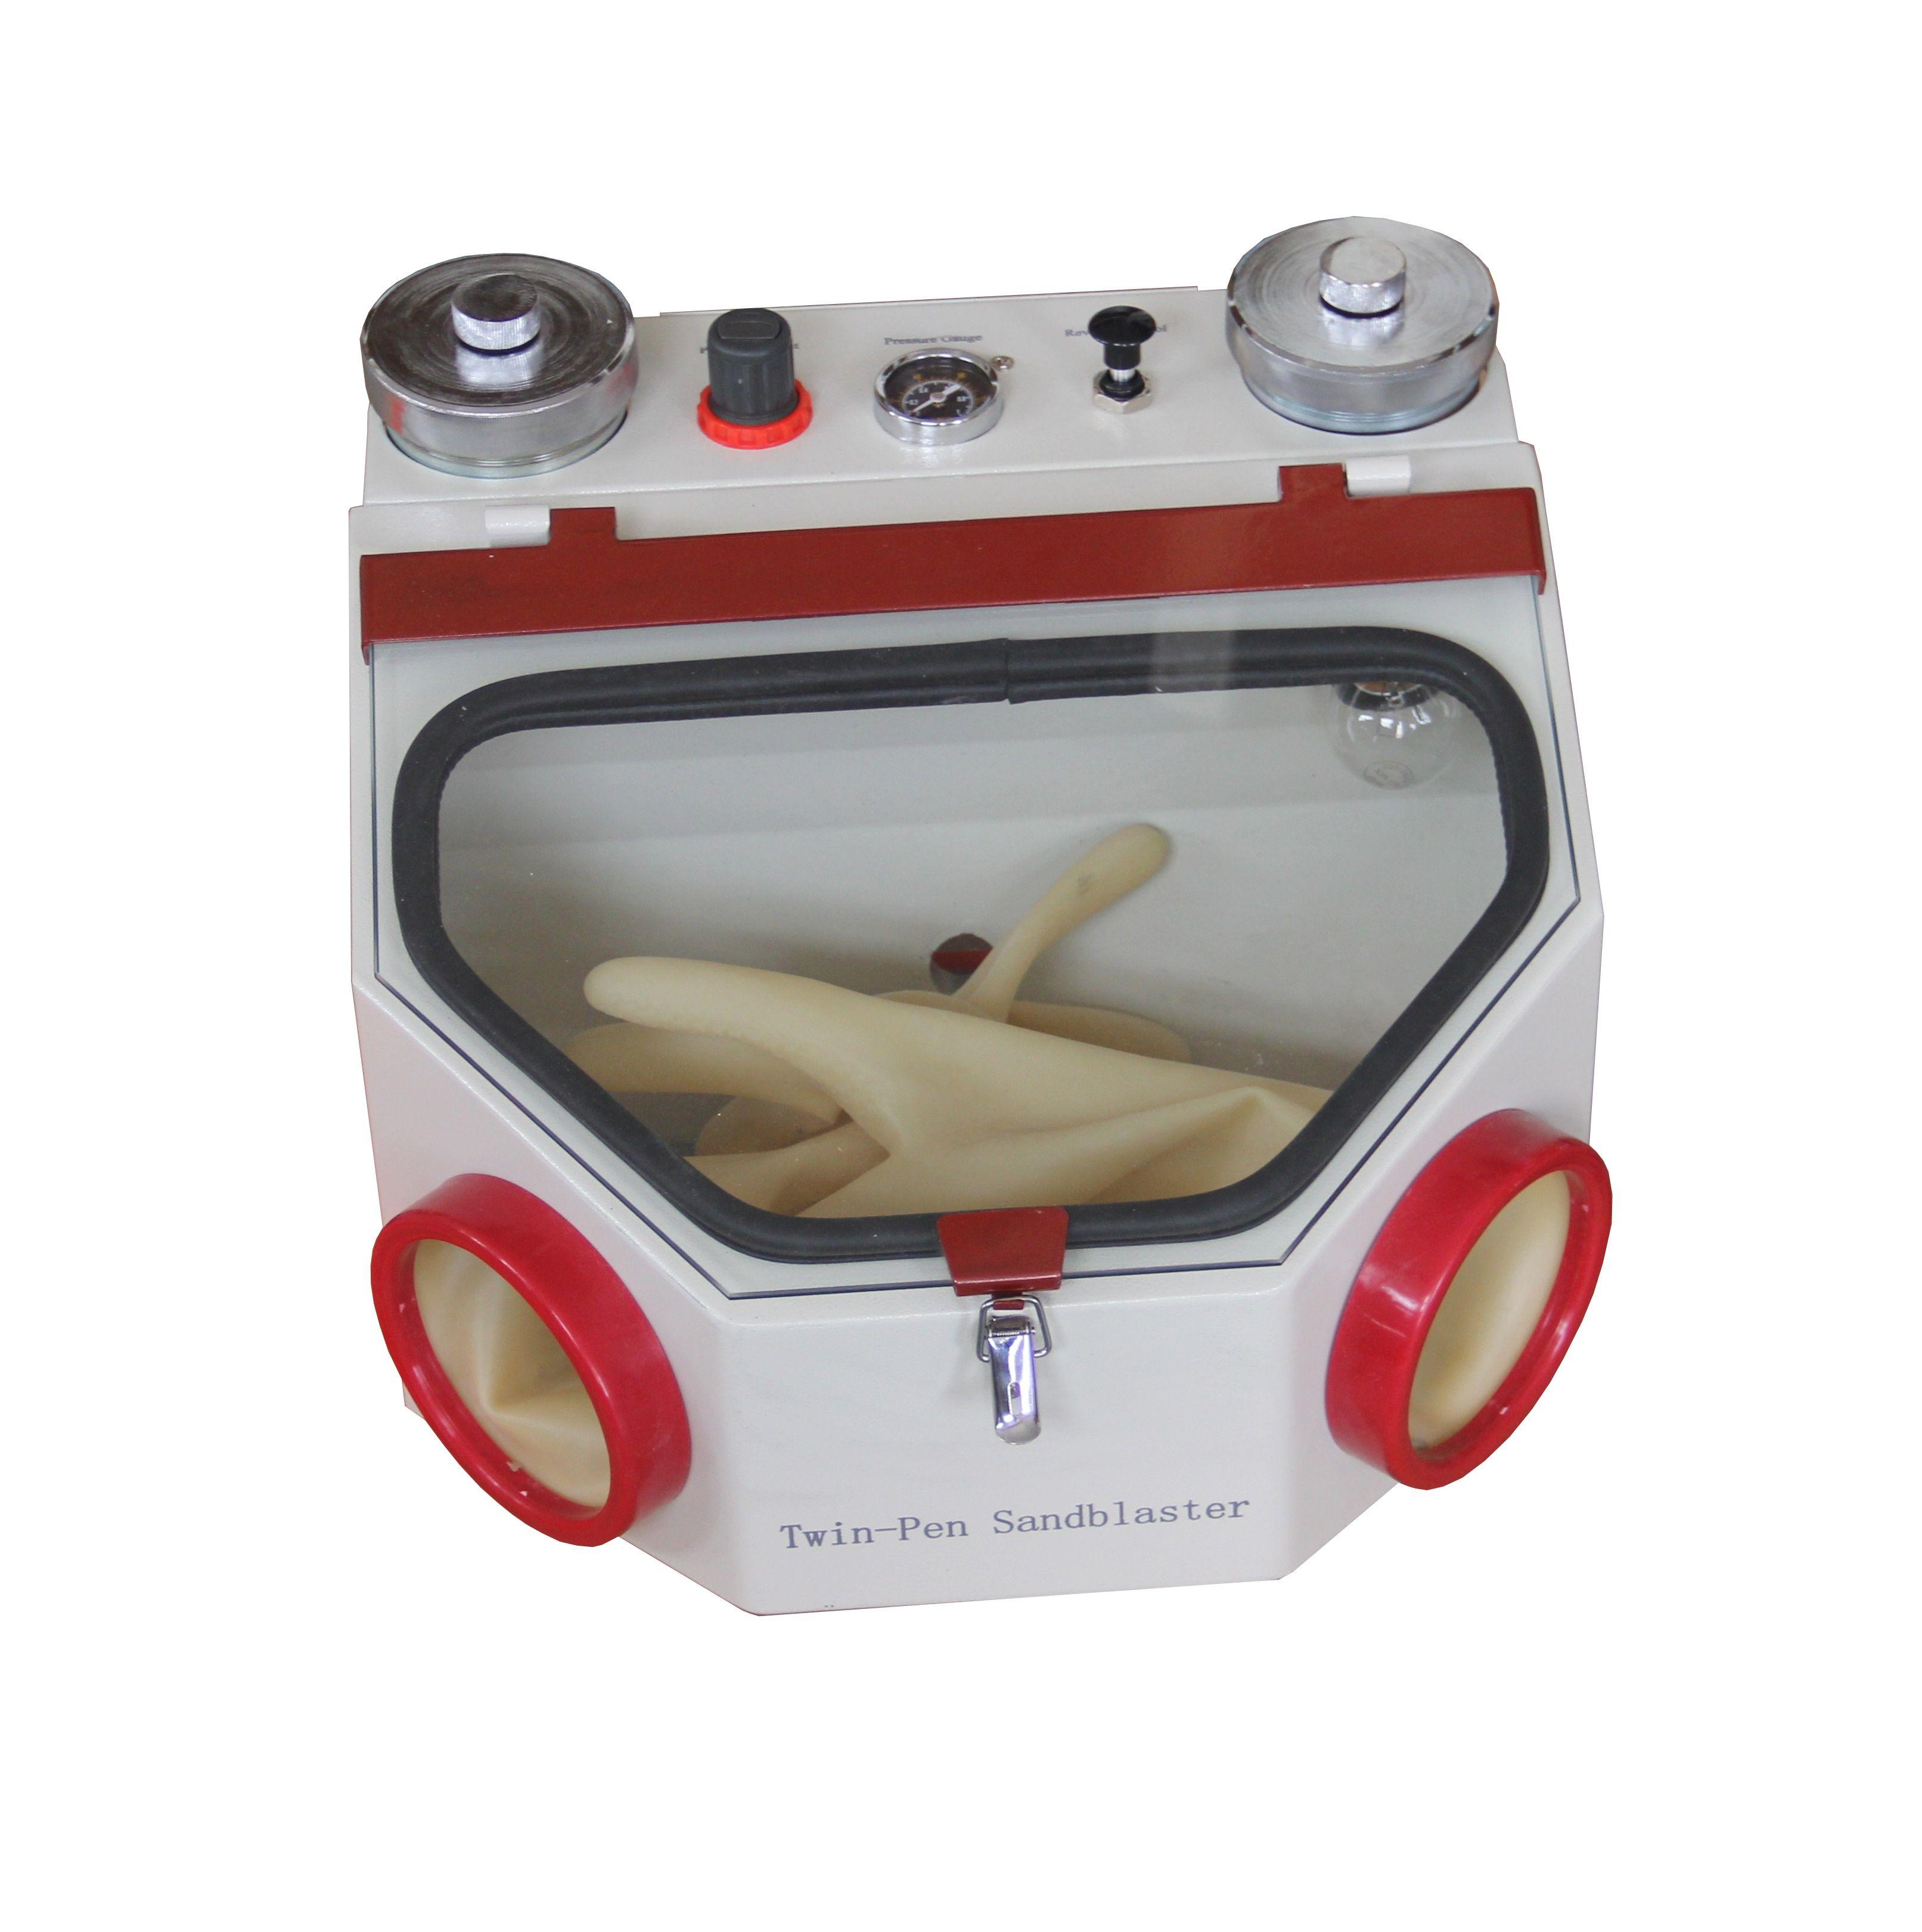 Dental Sand Blast Cabinet Suction Sand Blast Cabinet Mini Sand Blast Cabinet Lab Sand Blast Cabinet Dental Sand Equipment For Sale Mini Sandblaster Dental